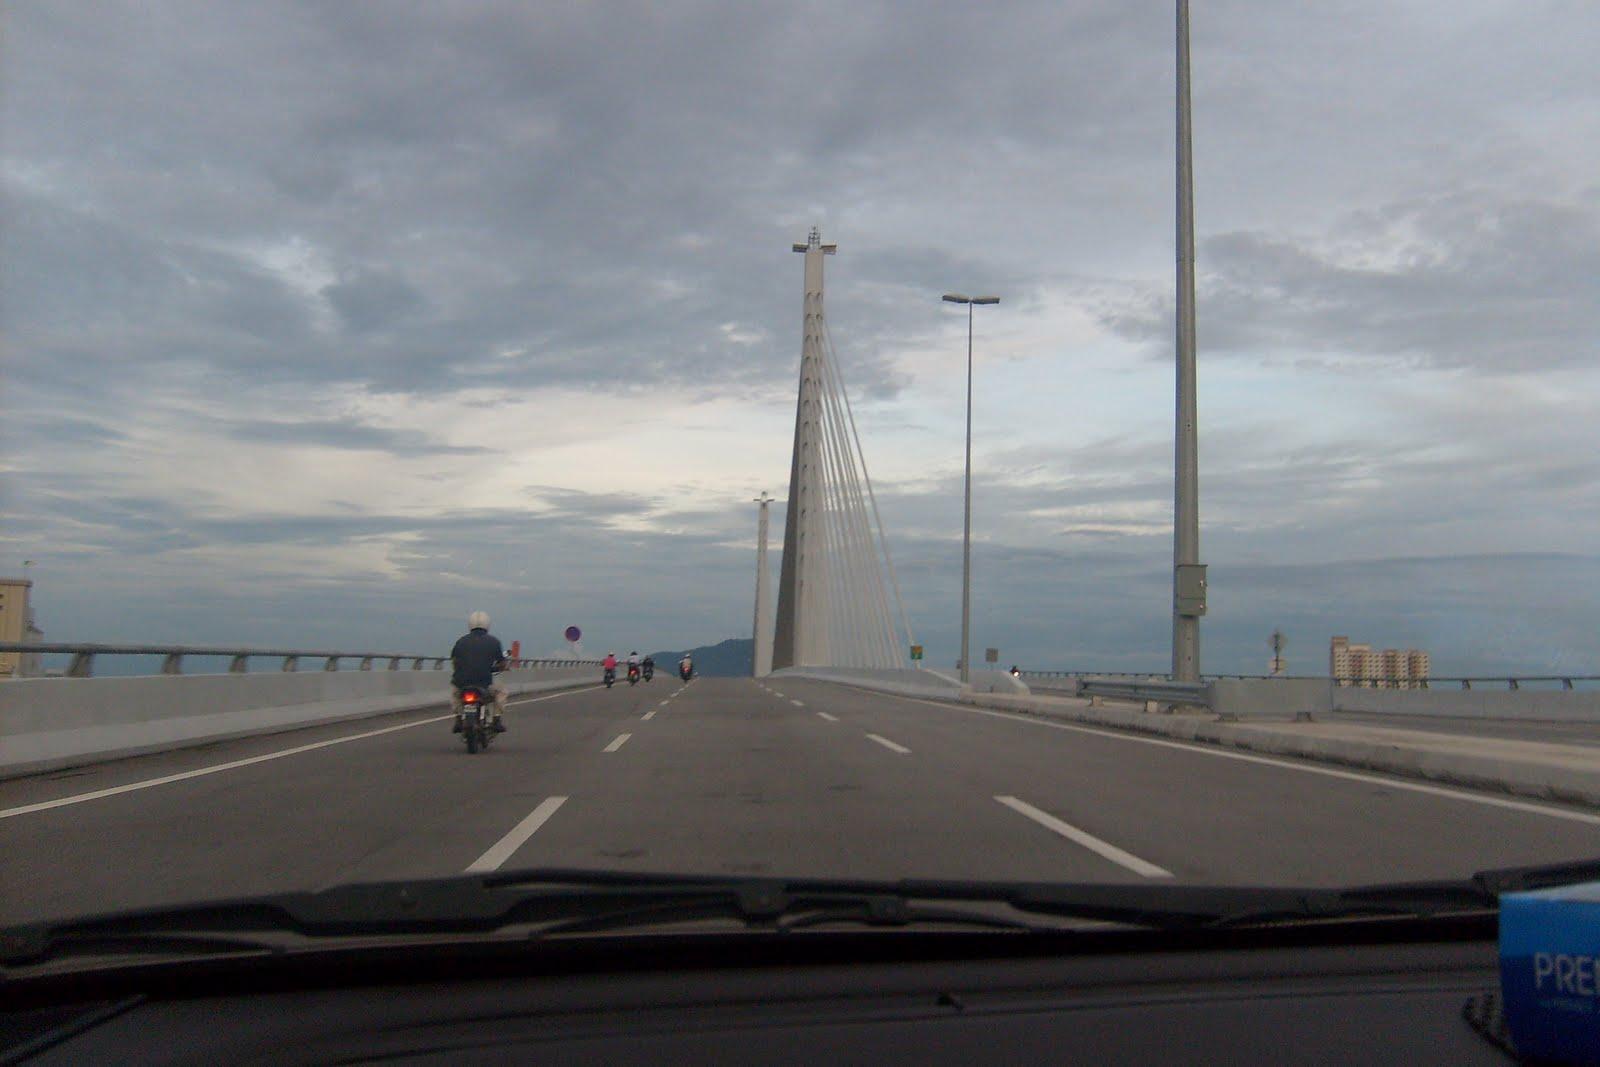 terajubintang7: Bukit Bendera, Pulau Pinang.